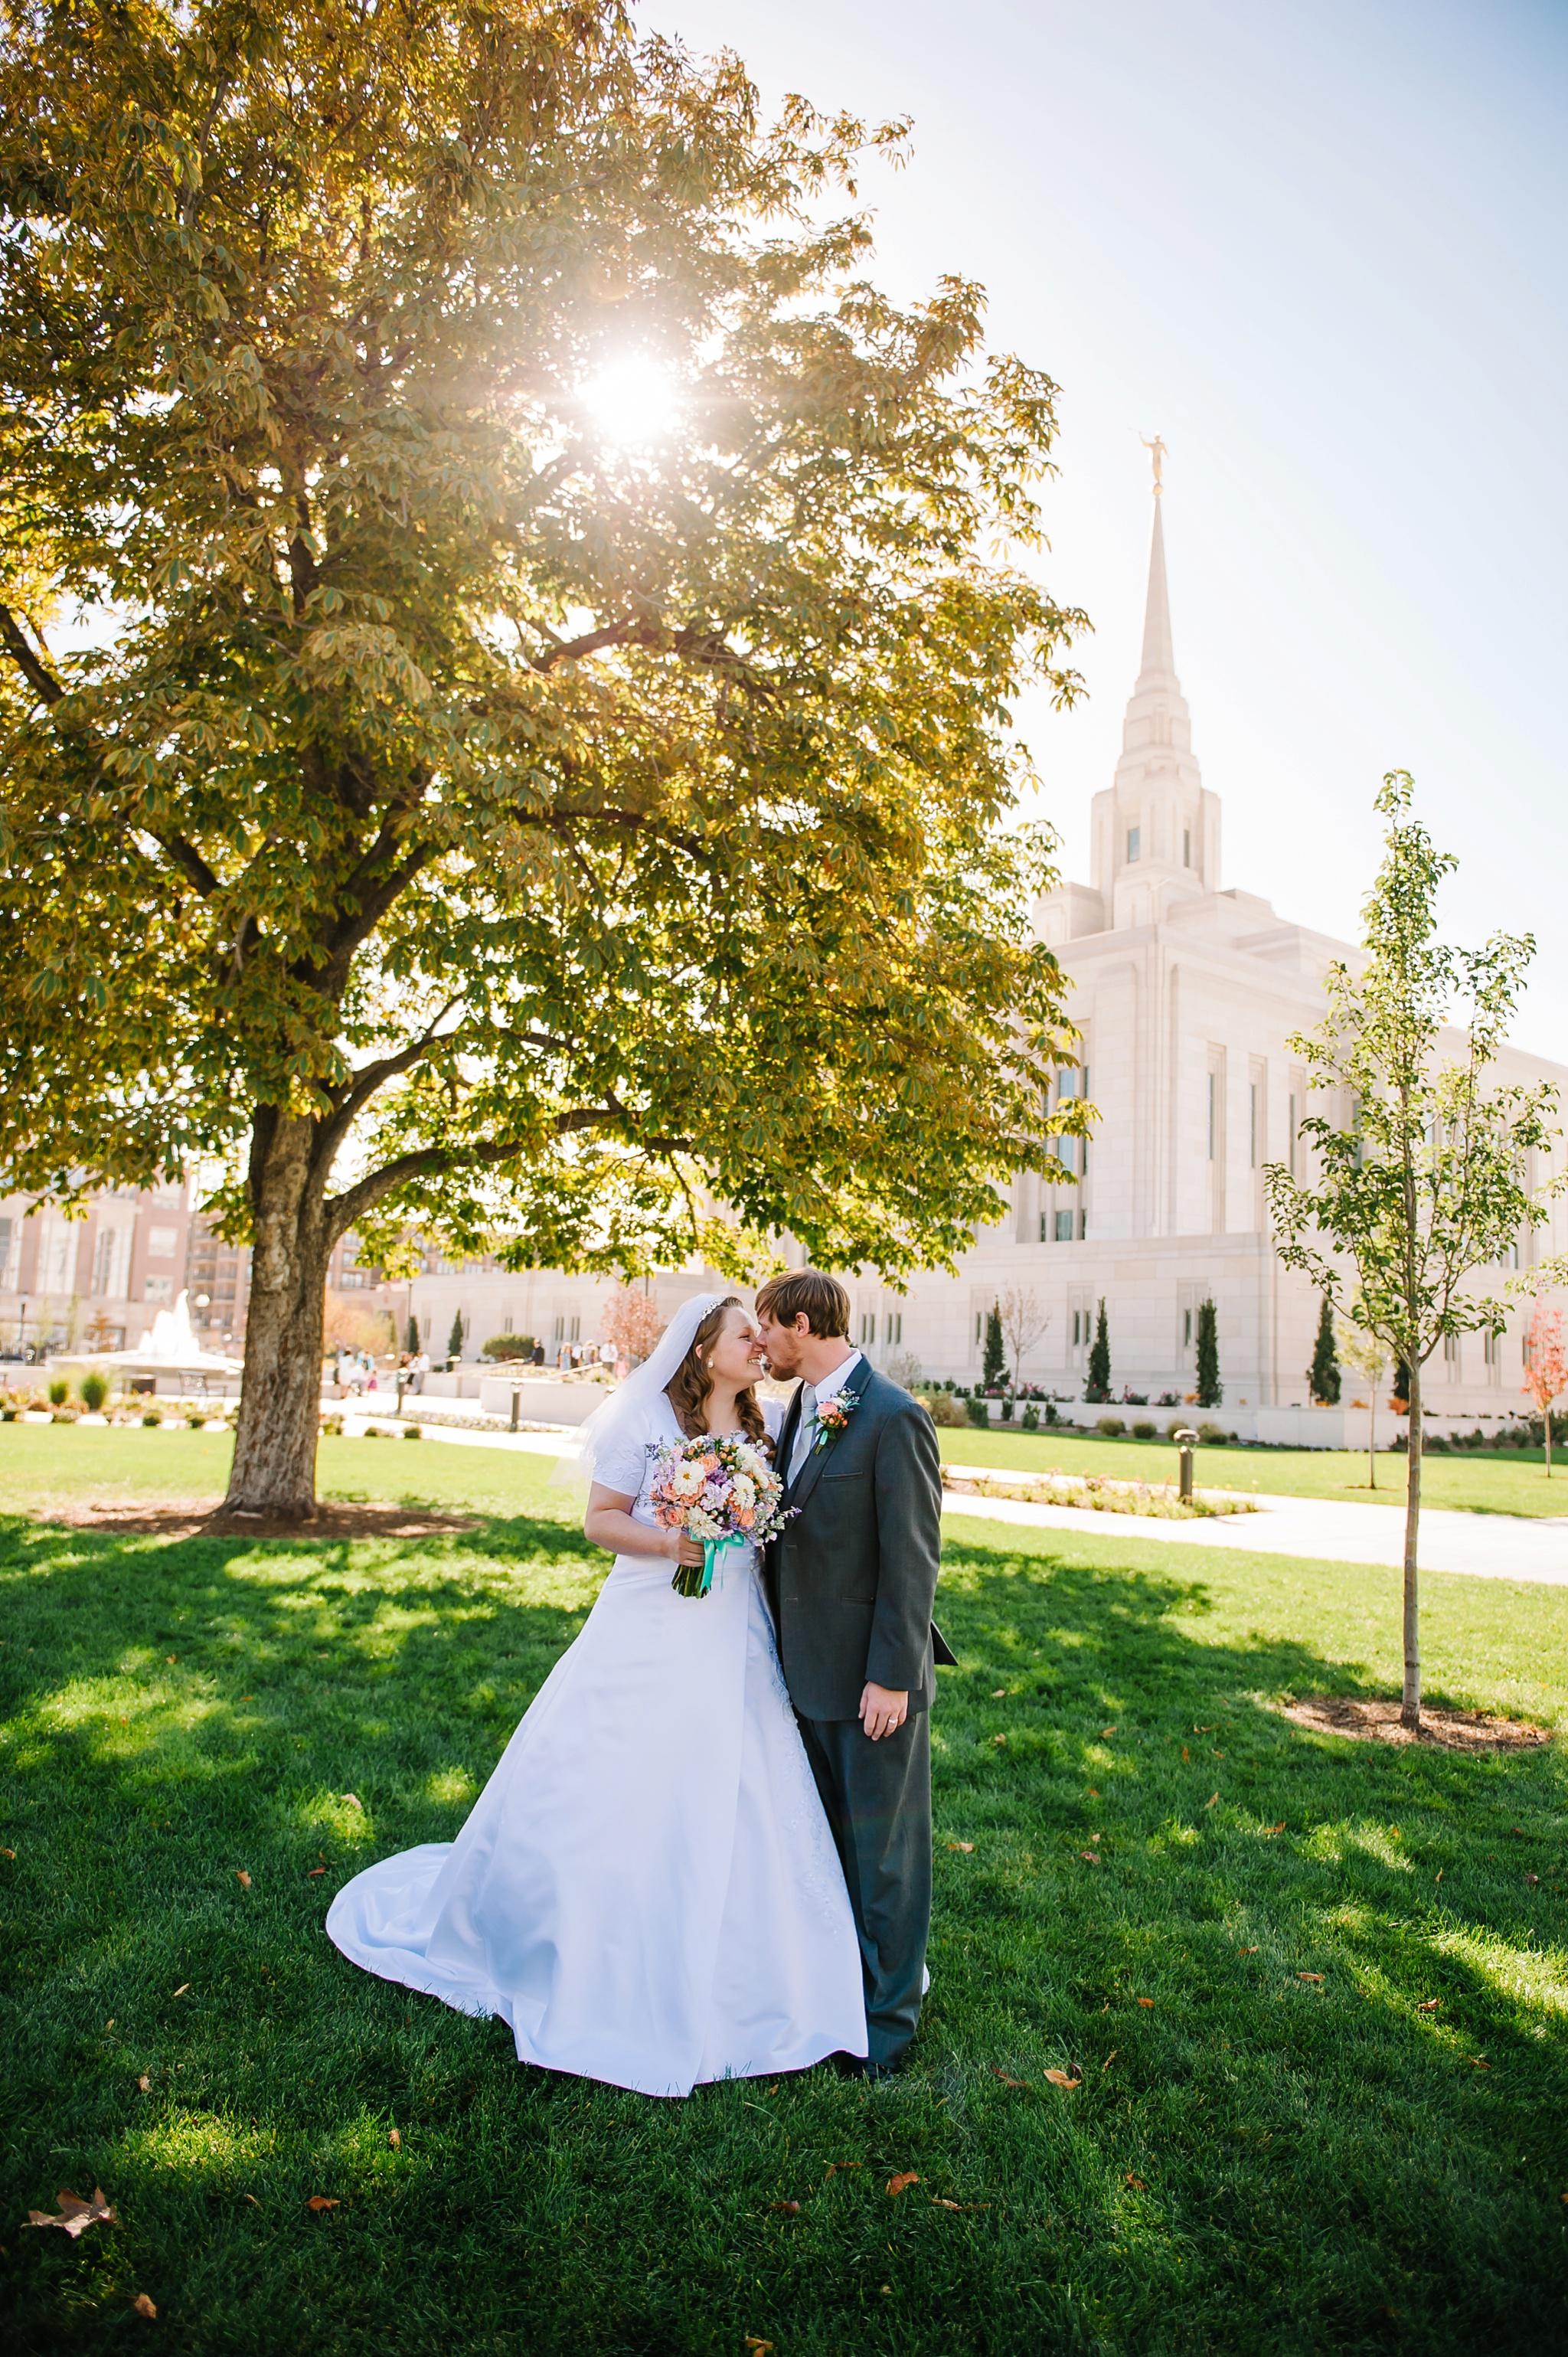 Utah Salt Lake Family Photographer Ali Sumsion 052